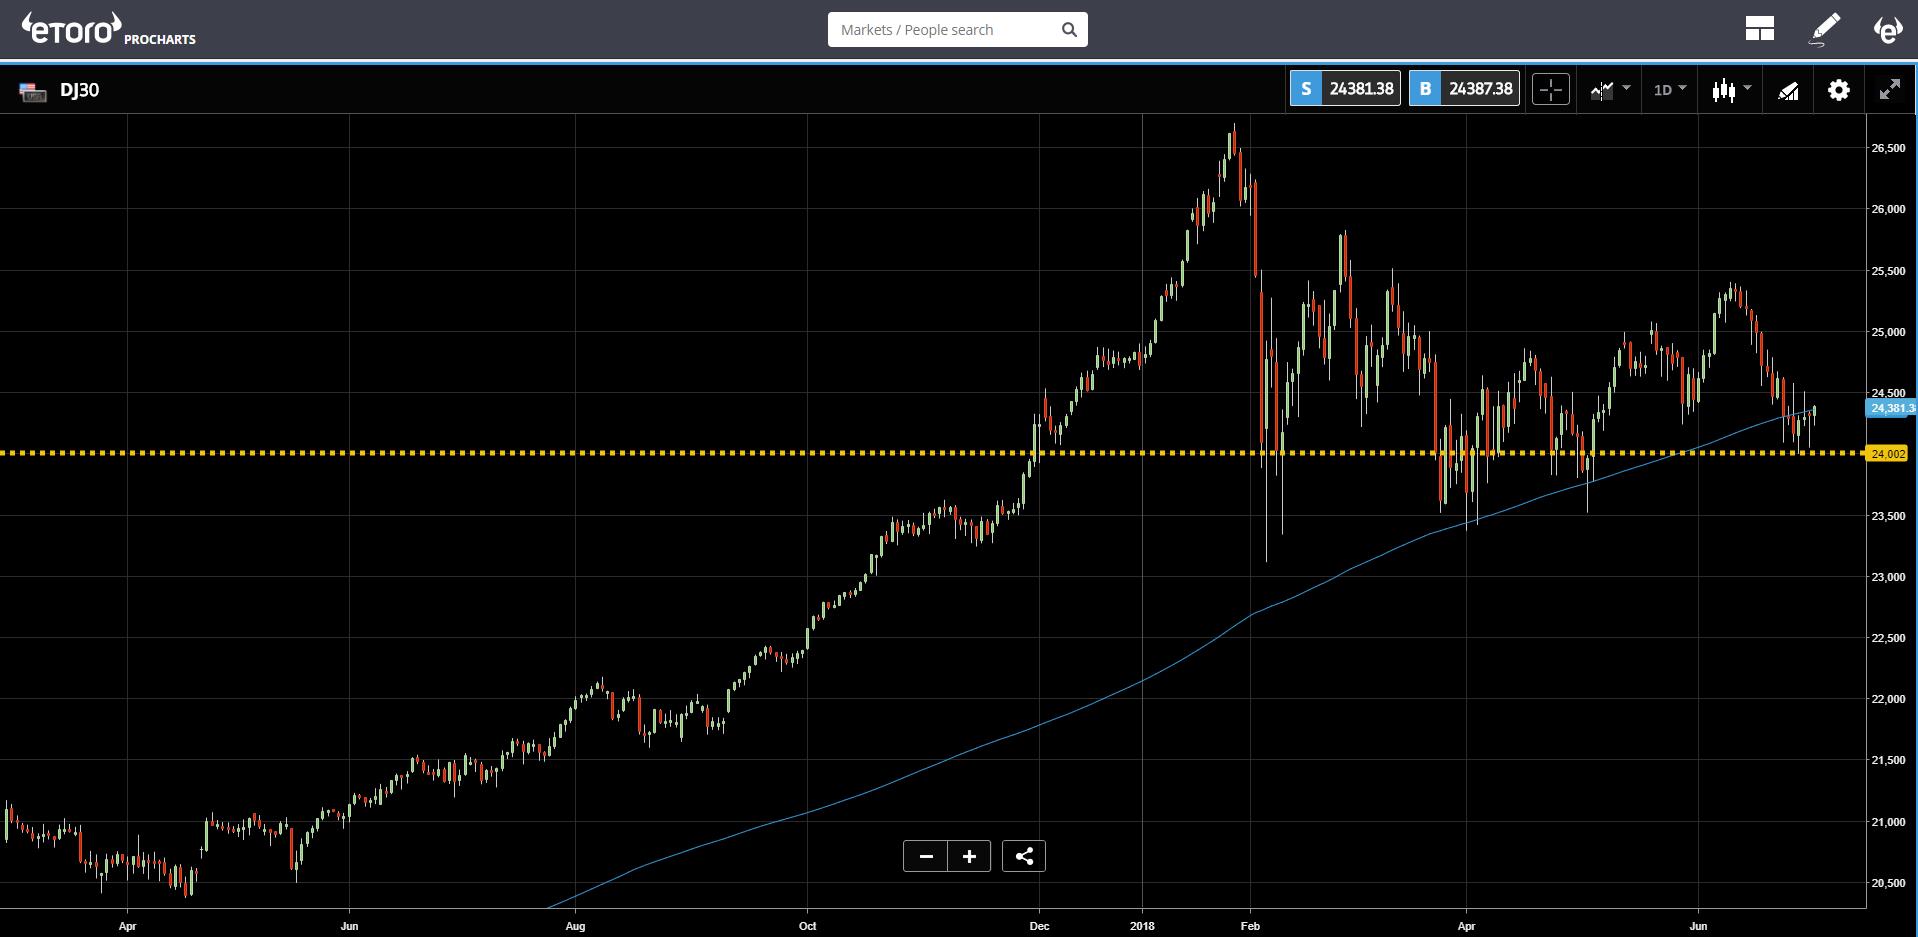 etoro, markets, cryptocurrency, trading, mining